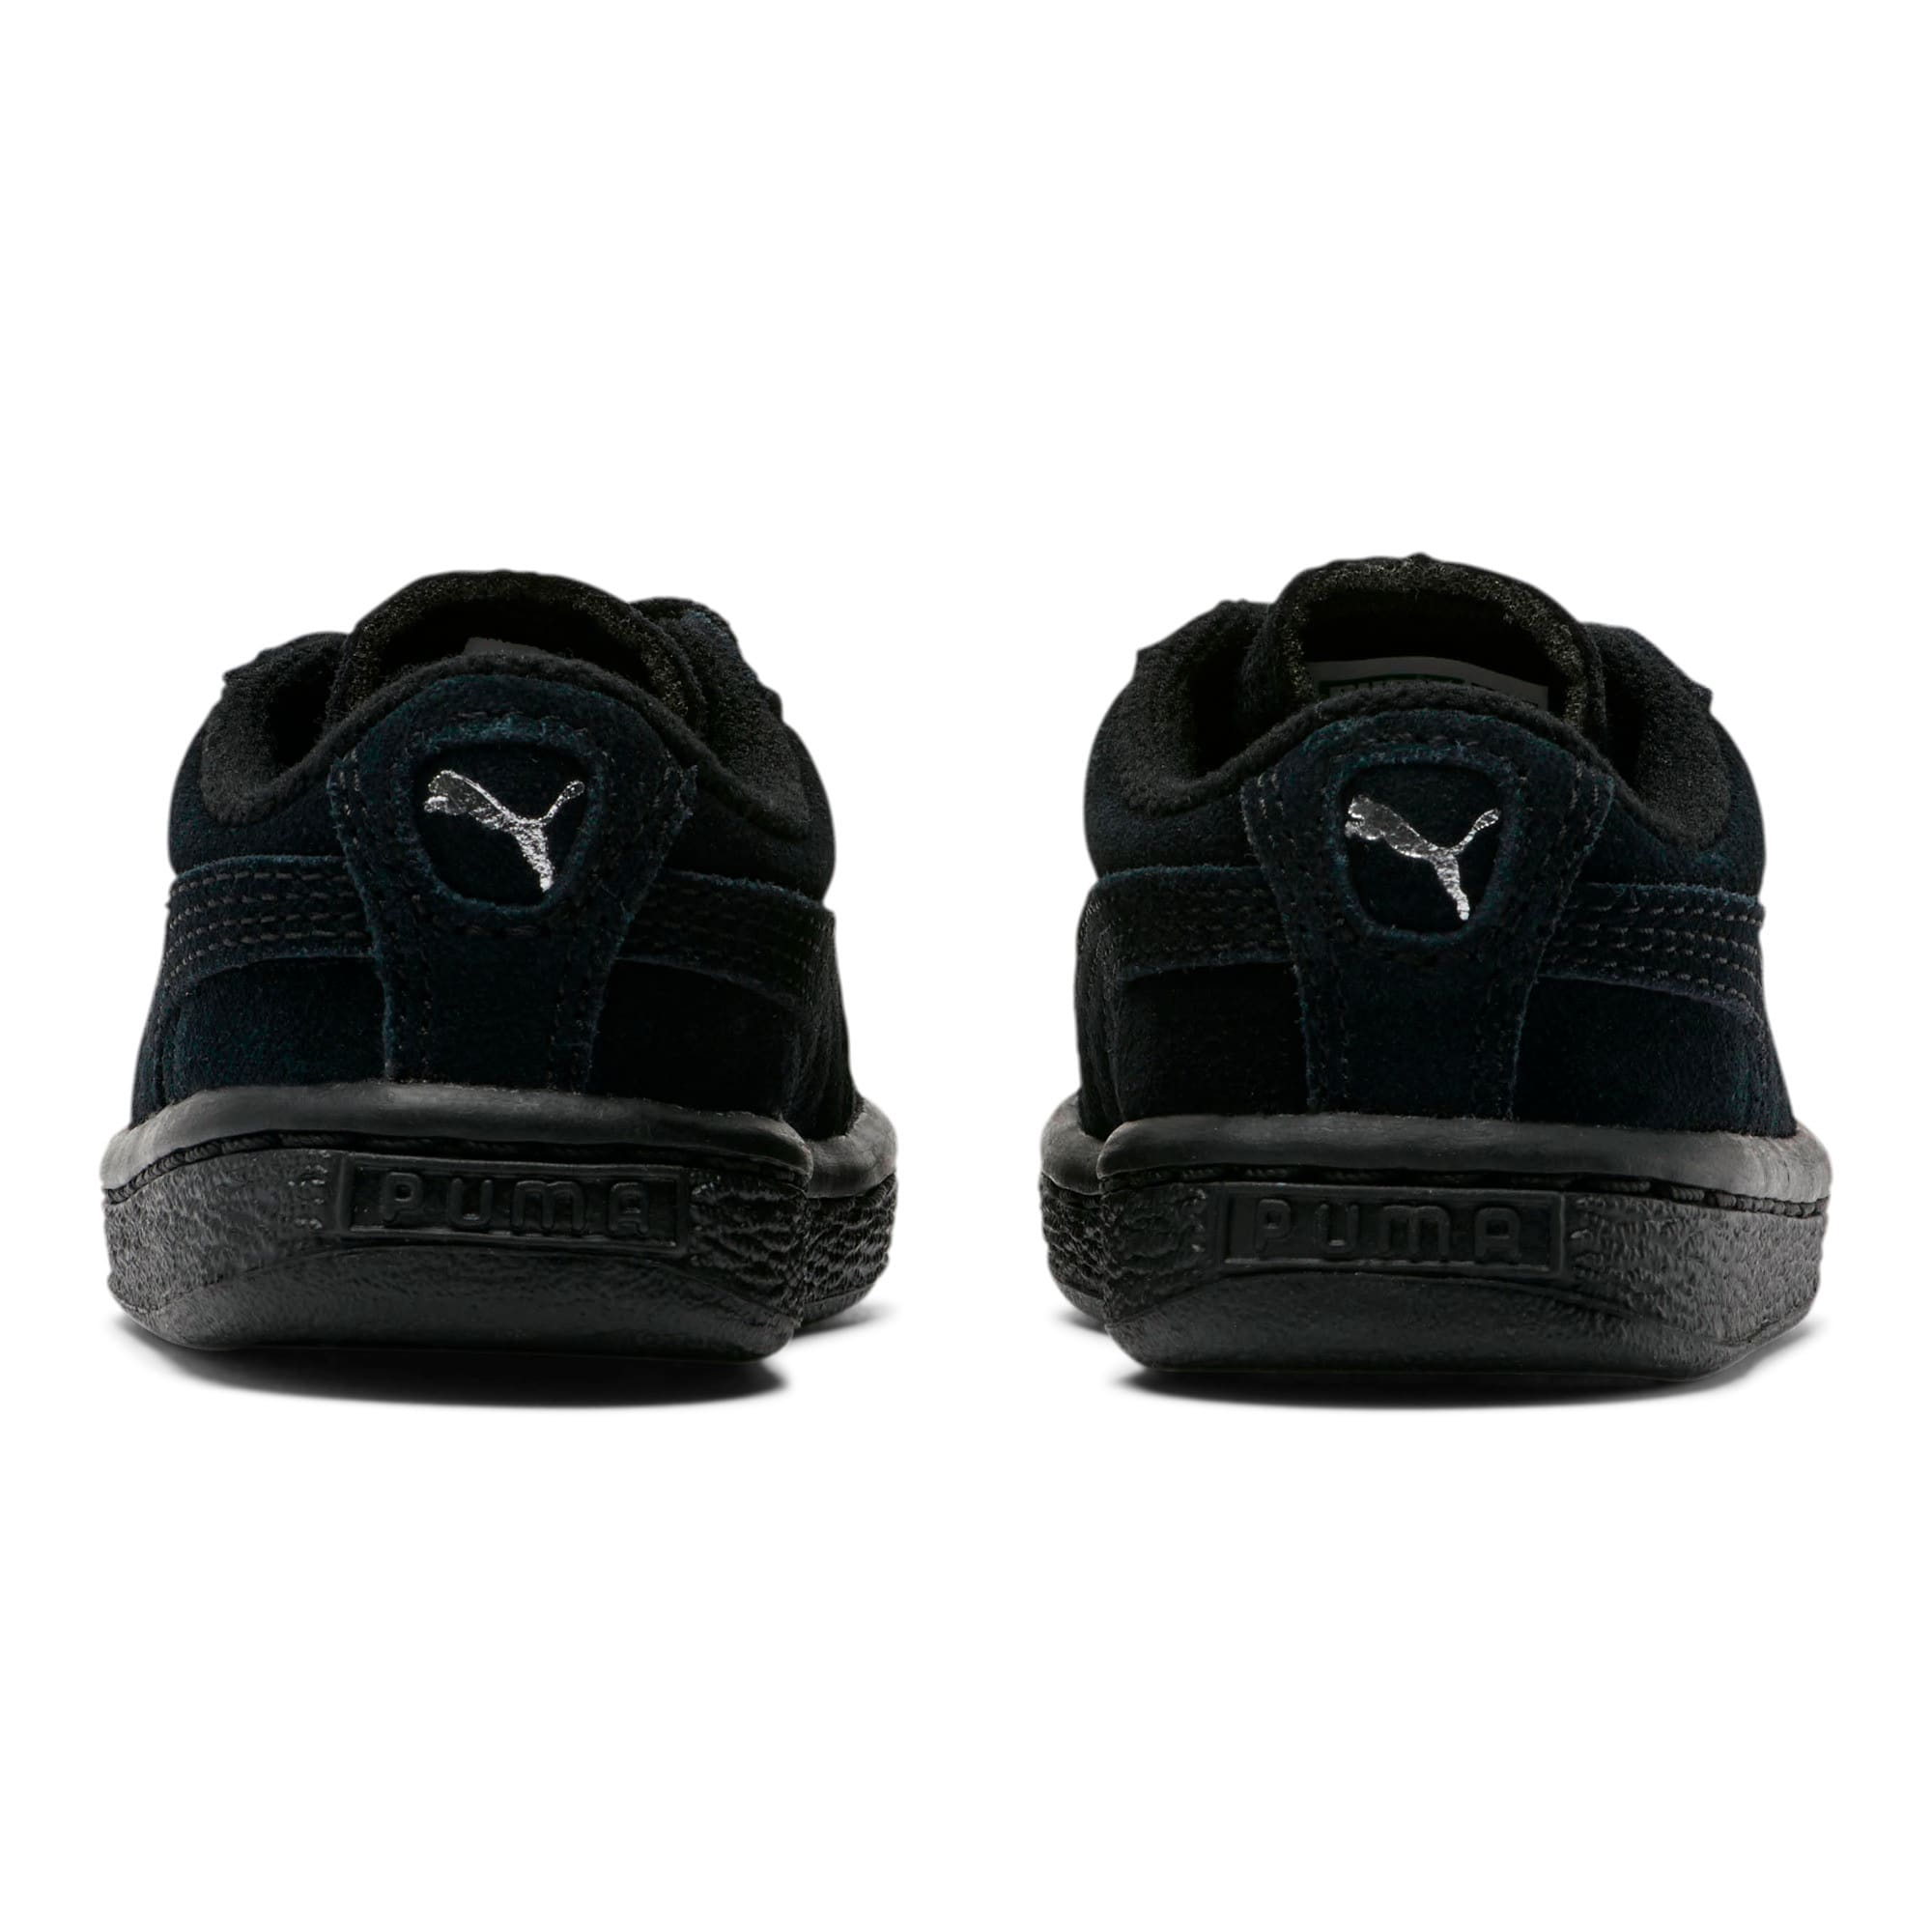 Thumbnail 3 of Puma Suede Toddler Shoes, black-puma silver, medium